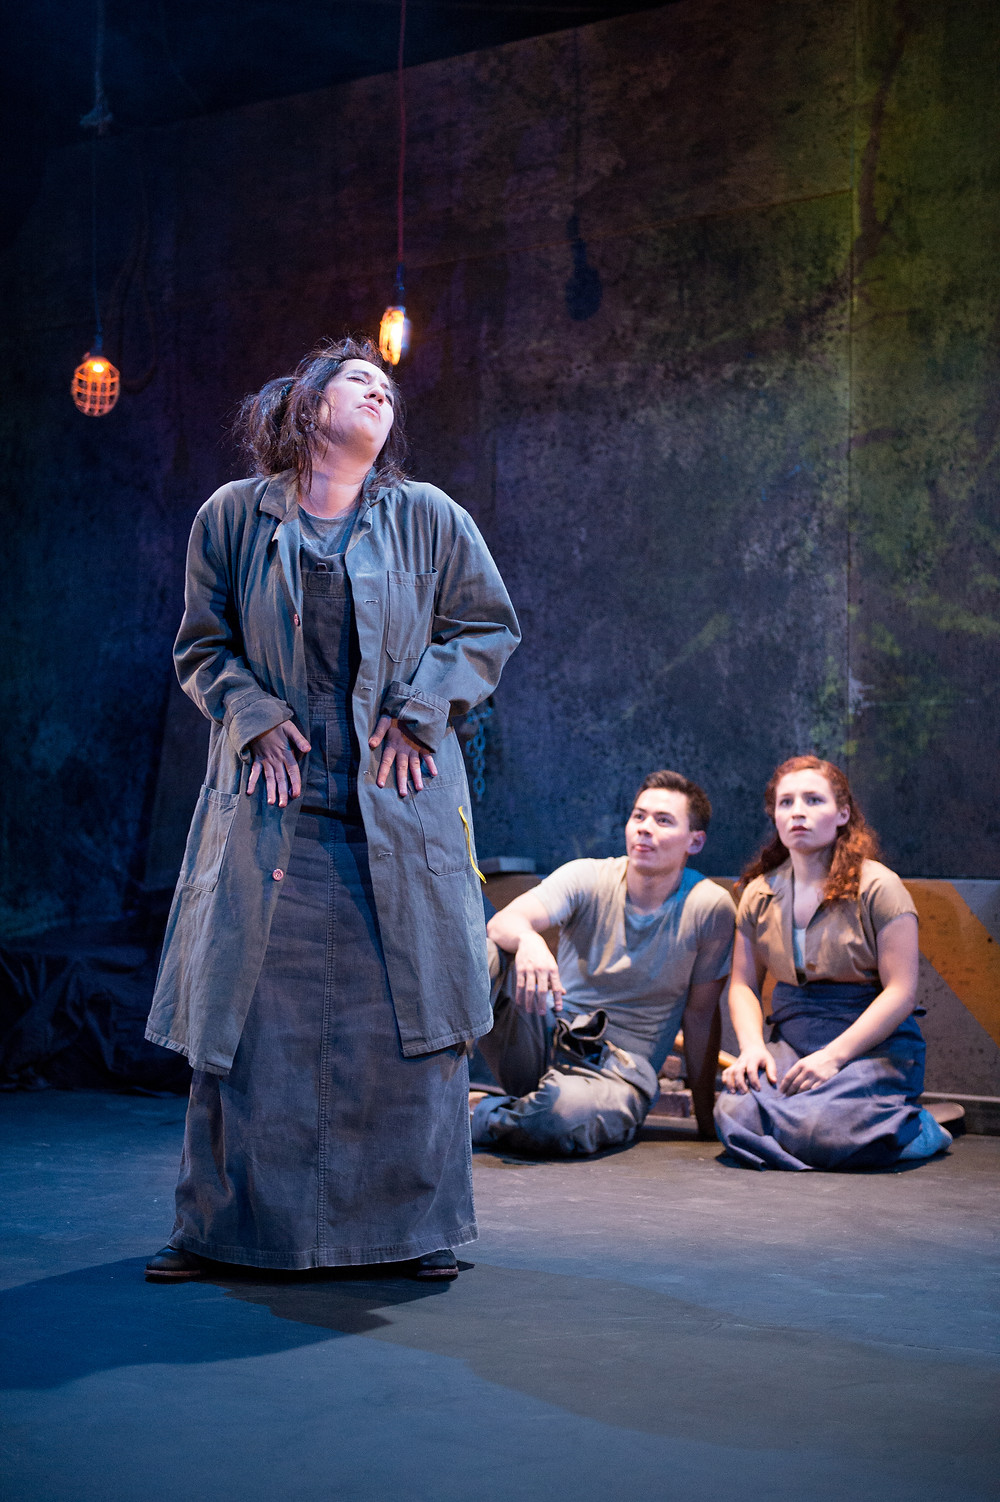 Hannah Jane Ginsberg as Titania, Nick Ong as Lysander, Kelly Letourneau as Hermia